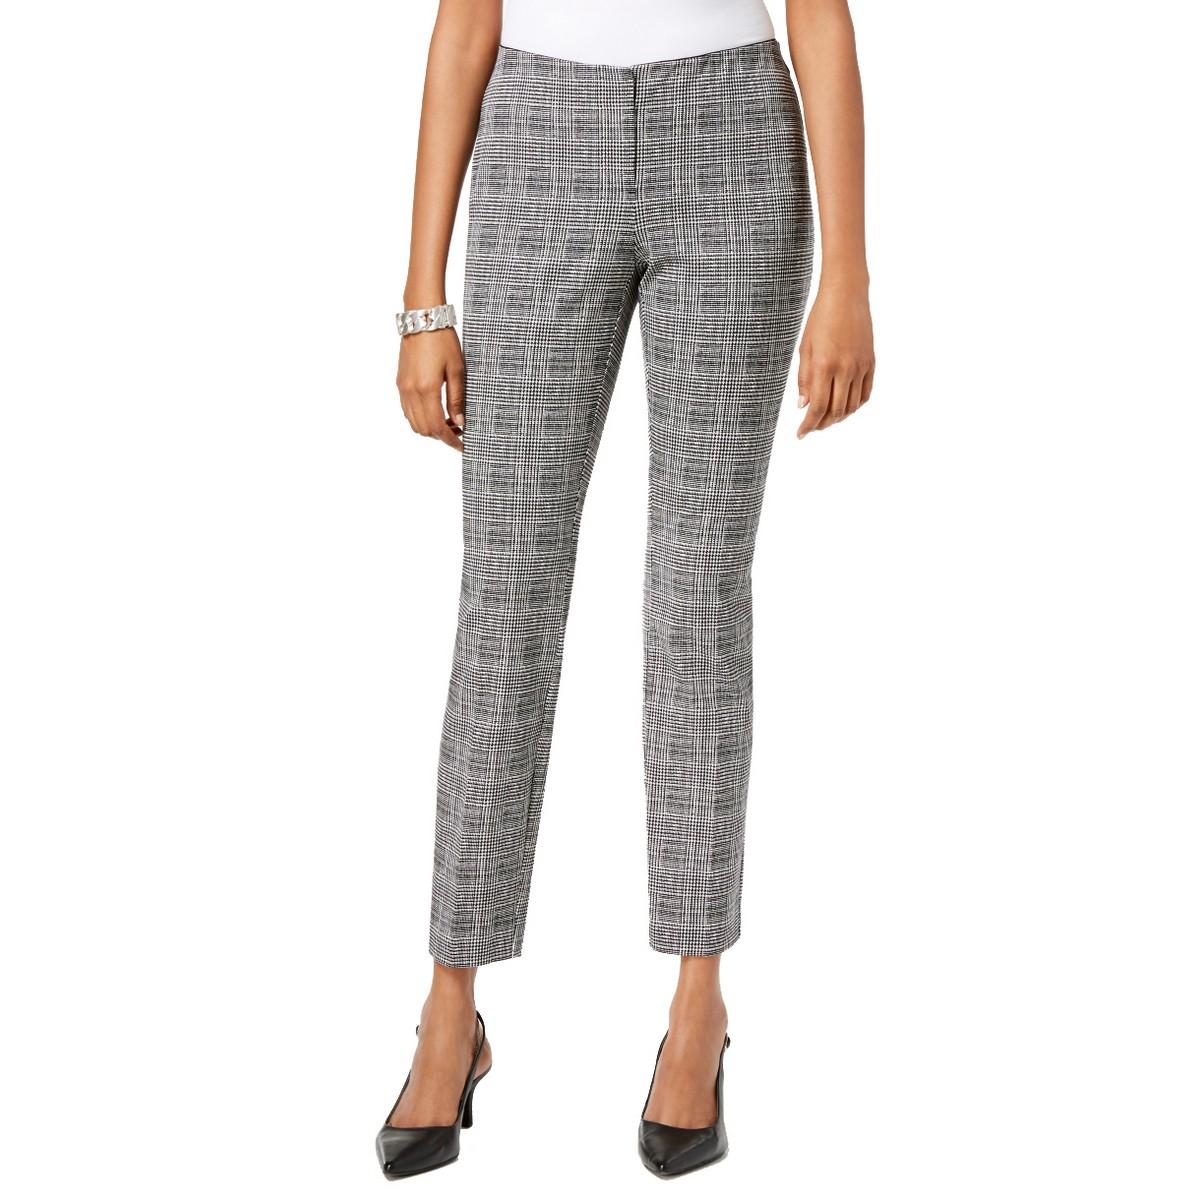 ALFANI NEW Women/'s Comfort Waist Ankle Cropped Skinny Pants TEDO